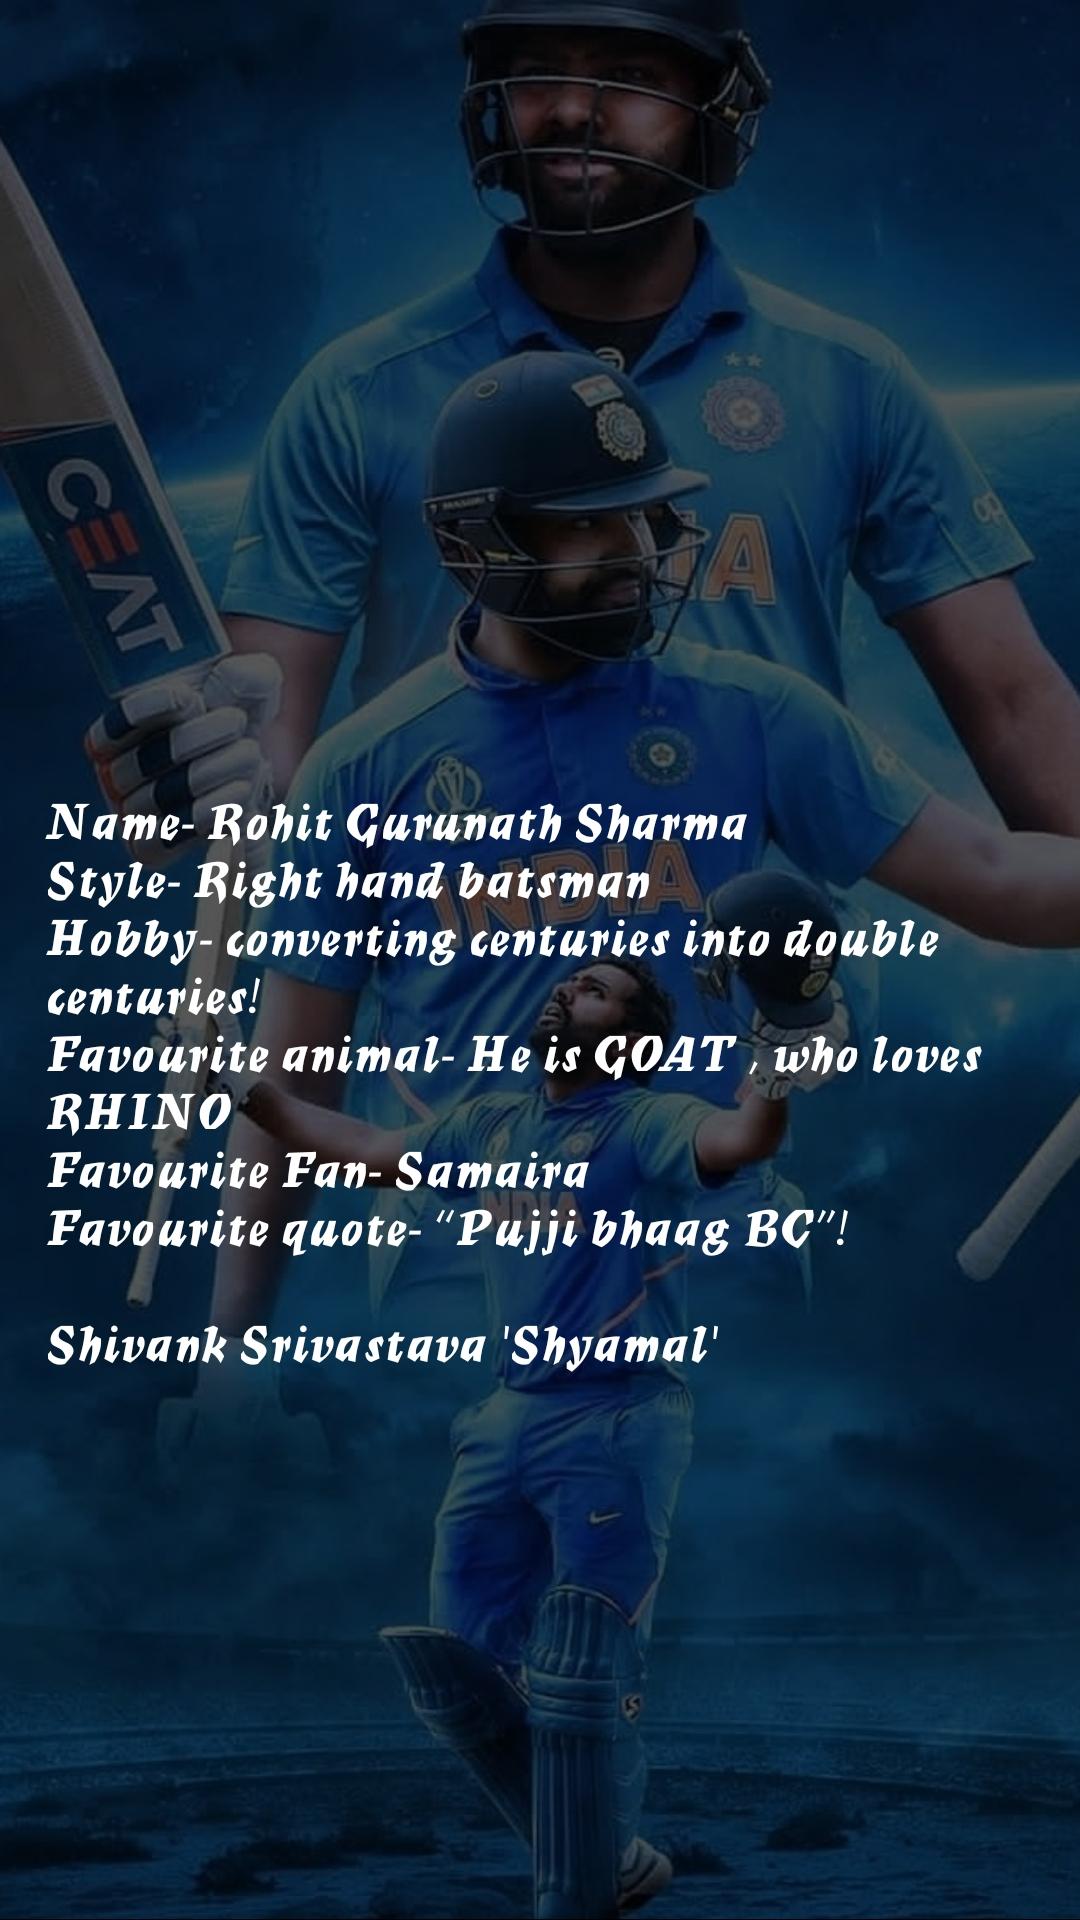 "Name- Rohit Gurunath Sharma Style- Right hand batsman Hobby- converting centuries into double centuries! Favourite animal- He is GOAT , who loves RHINO Favourite Fan- Samaira Favourite quote- ""Pujji bhaag BC""!  Shivank Srivastava 'Shyamal'"